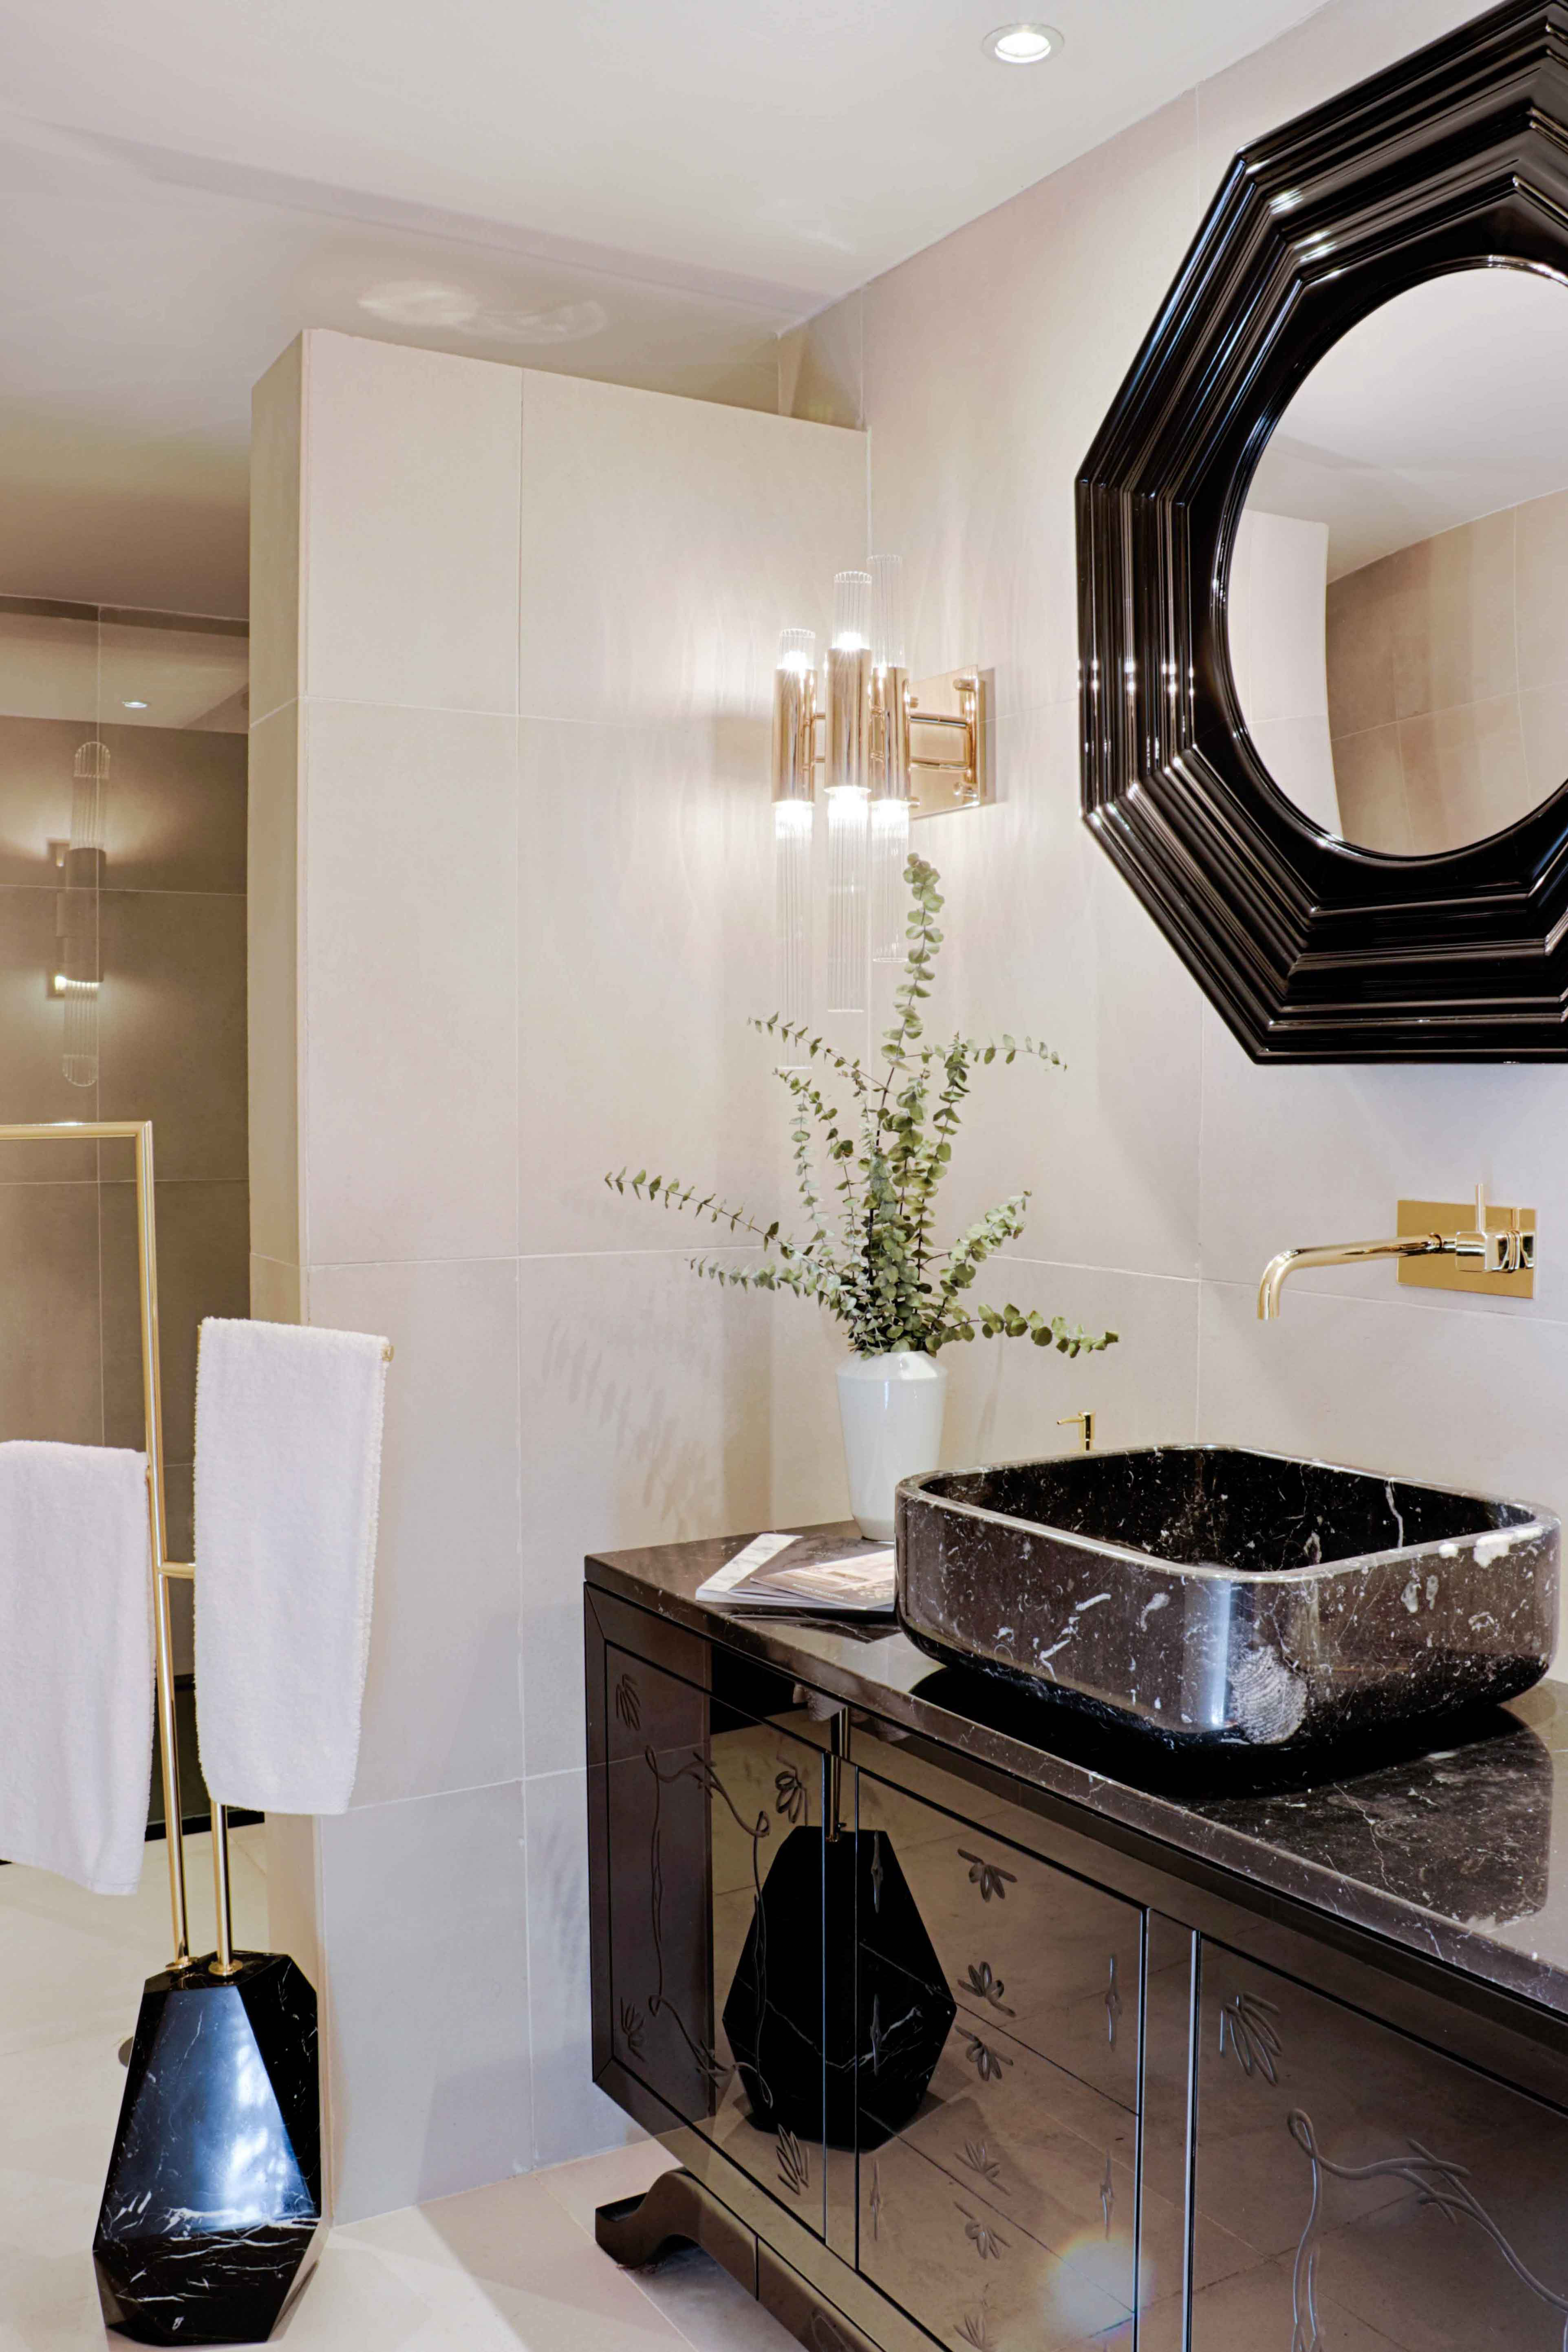 Golden and Luxurious Taps 4 Golden and Luxurious Taps for Any Bathroom 44 covet house bathroom 1 HR